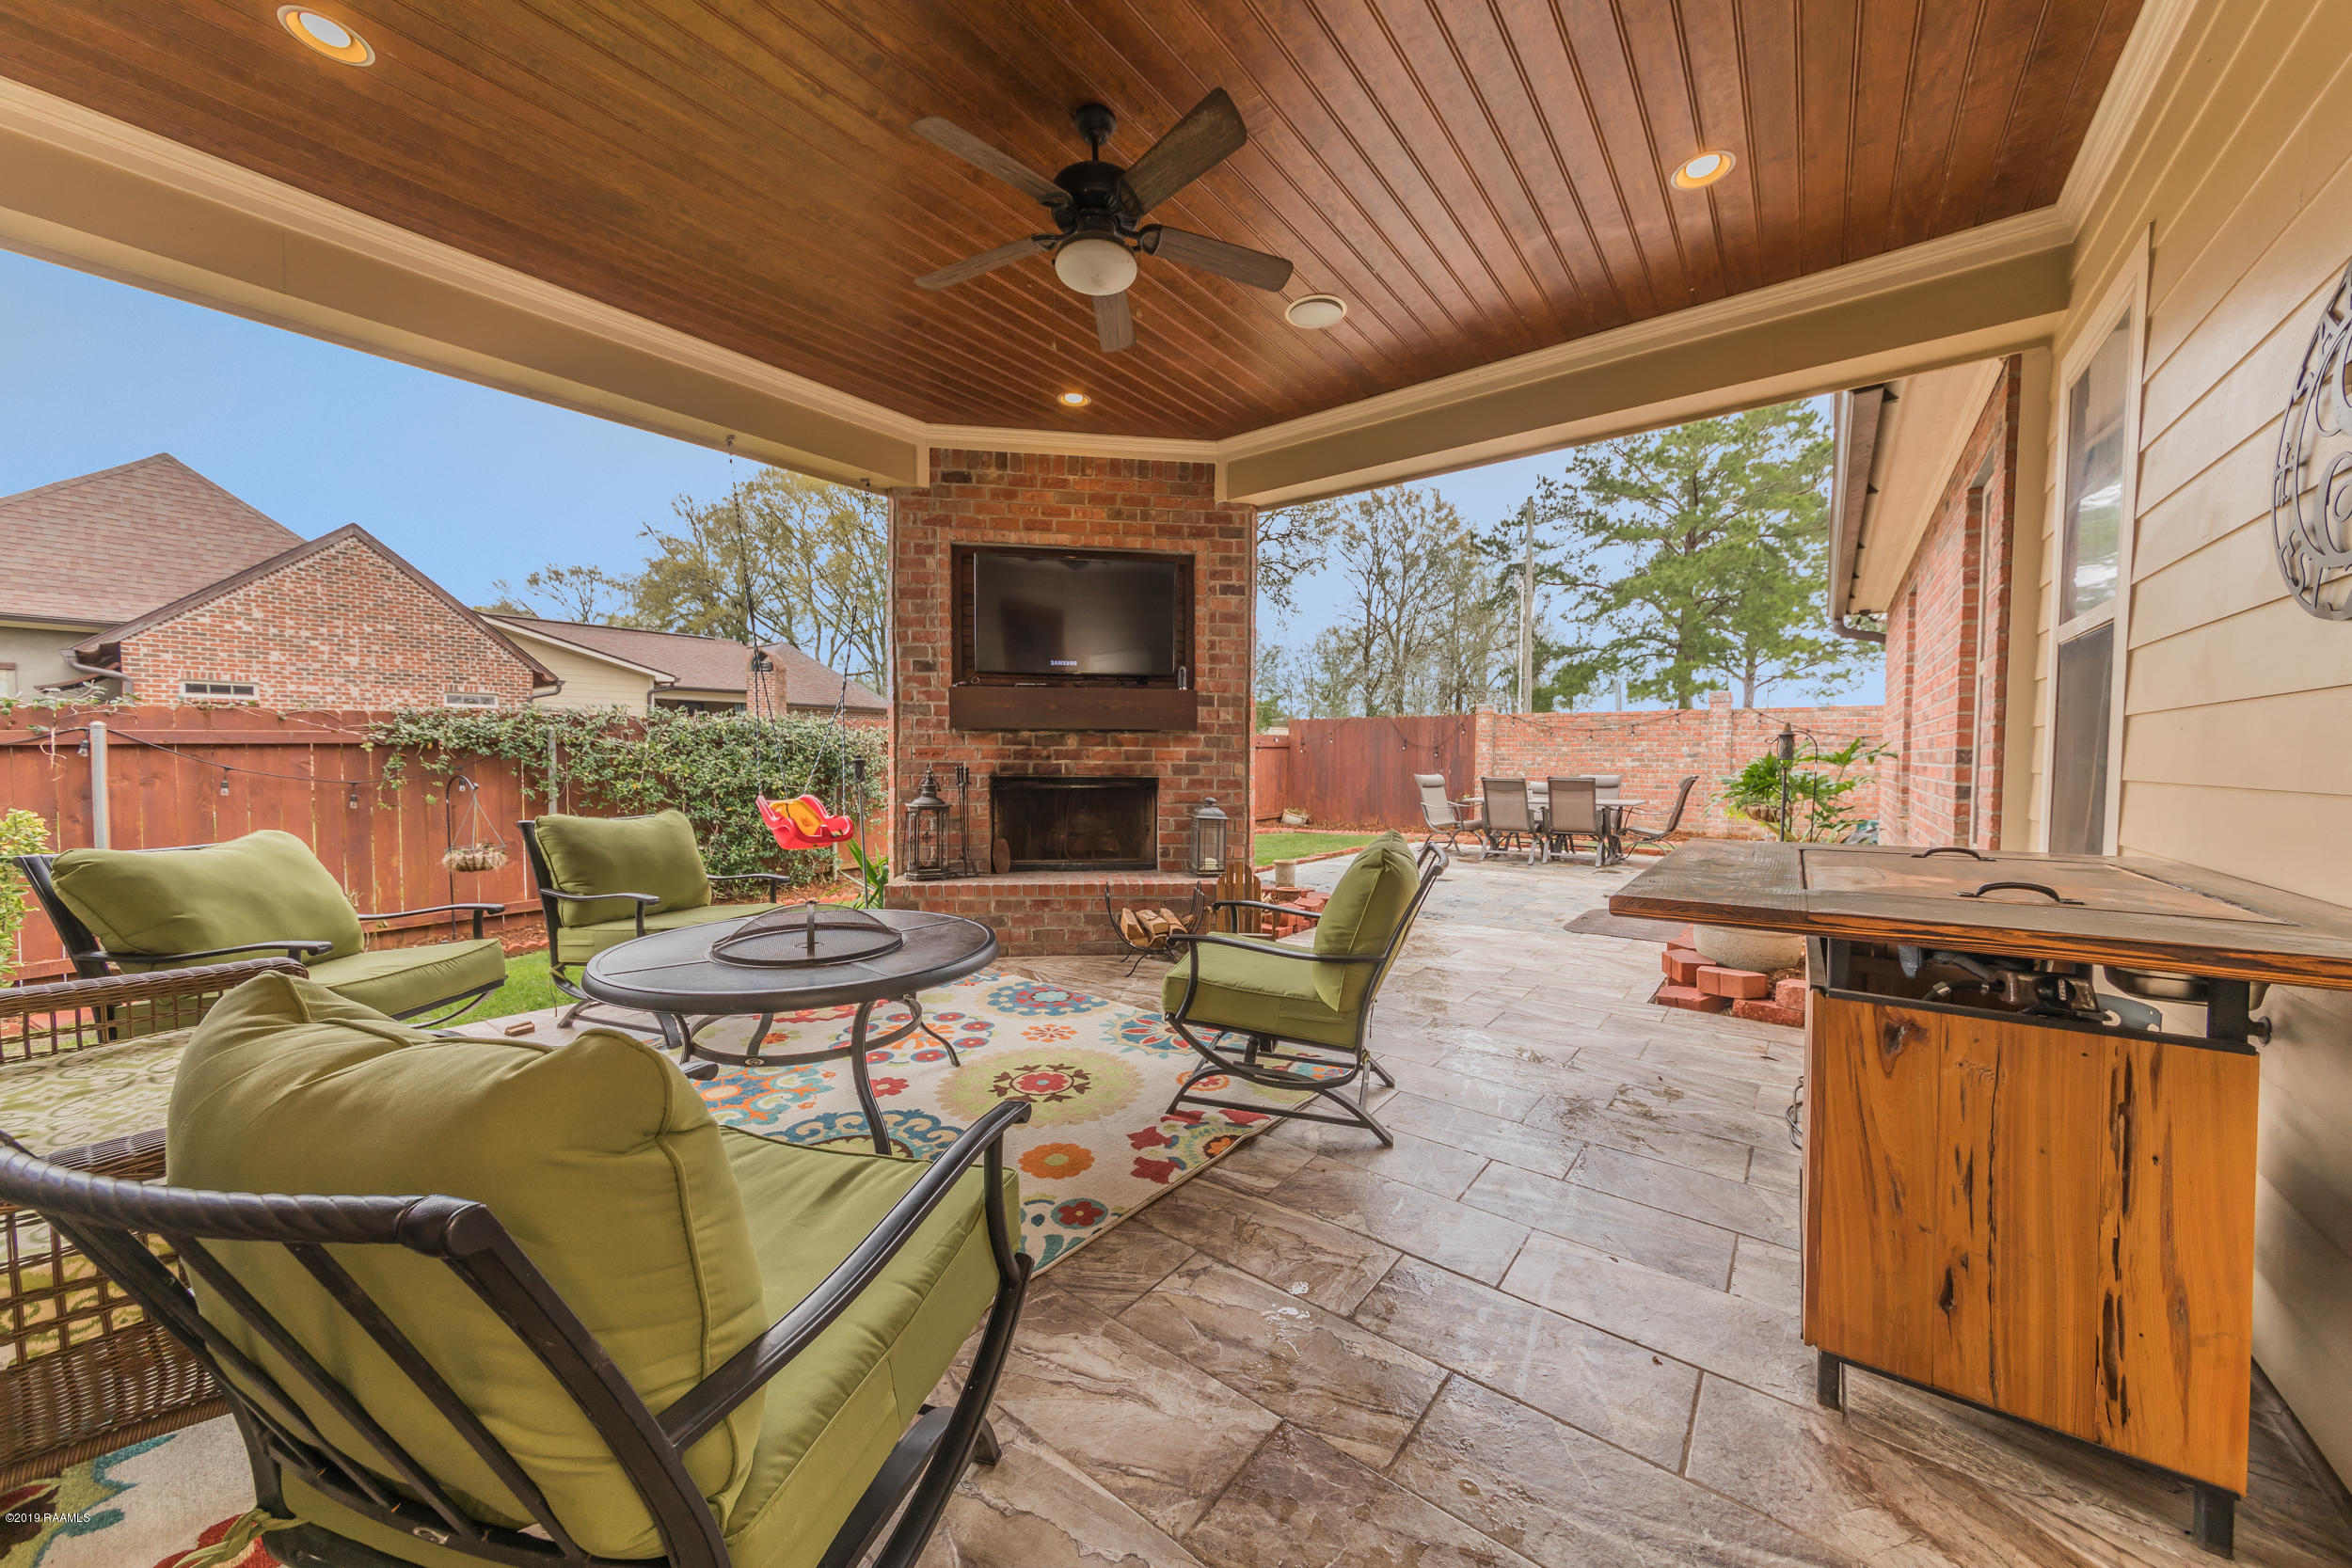 118 La Villa Circle, Youngsville, LA 70592 Photo #27